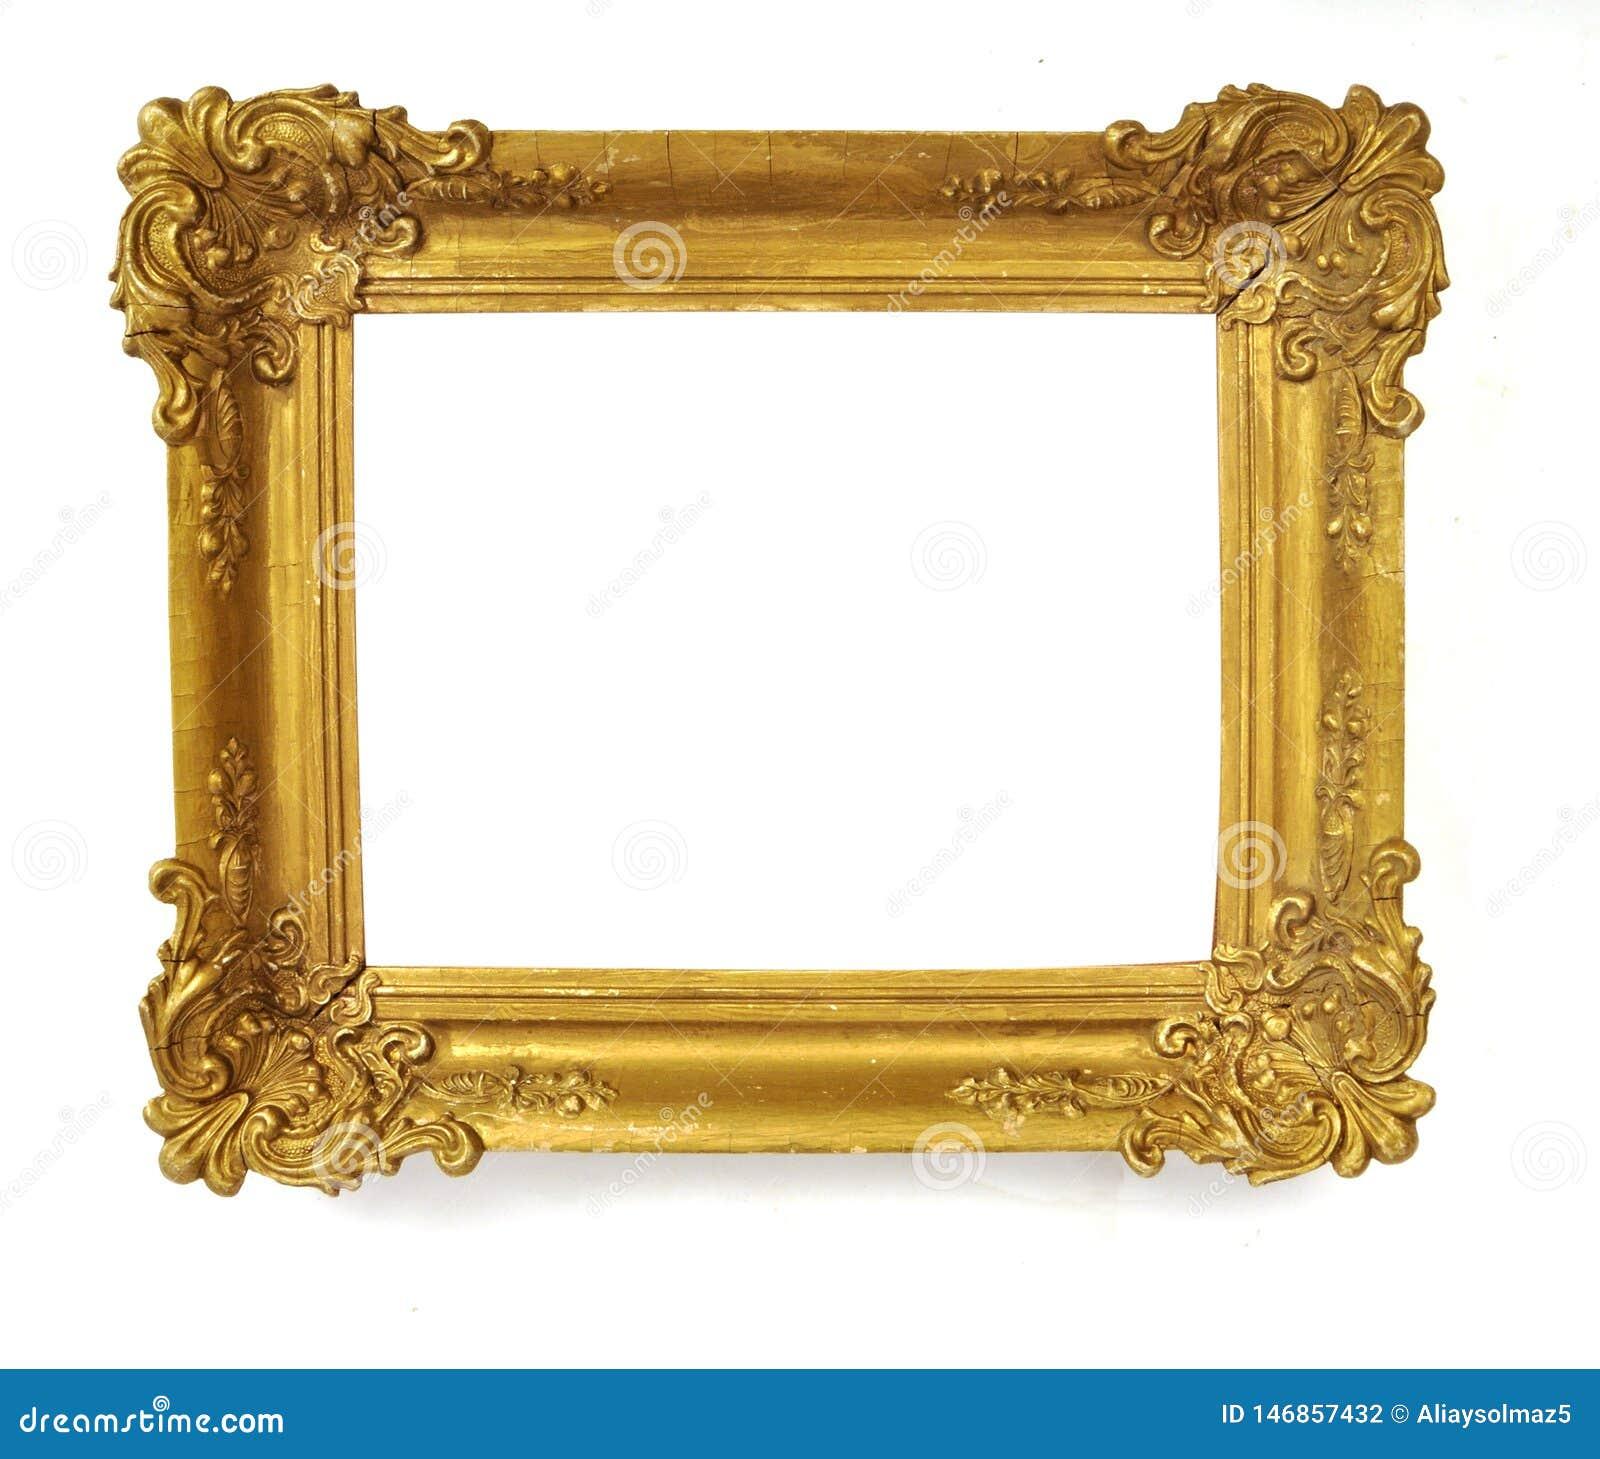 Isolated Photo Frame, Little Golden Antique Photo Frame, Vintage Frame